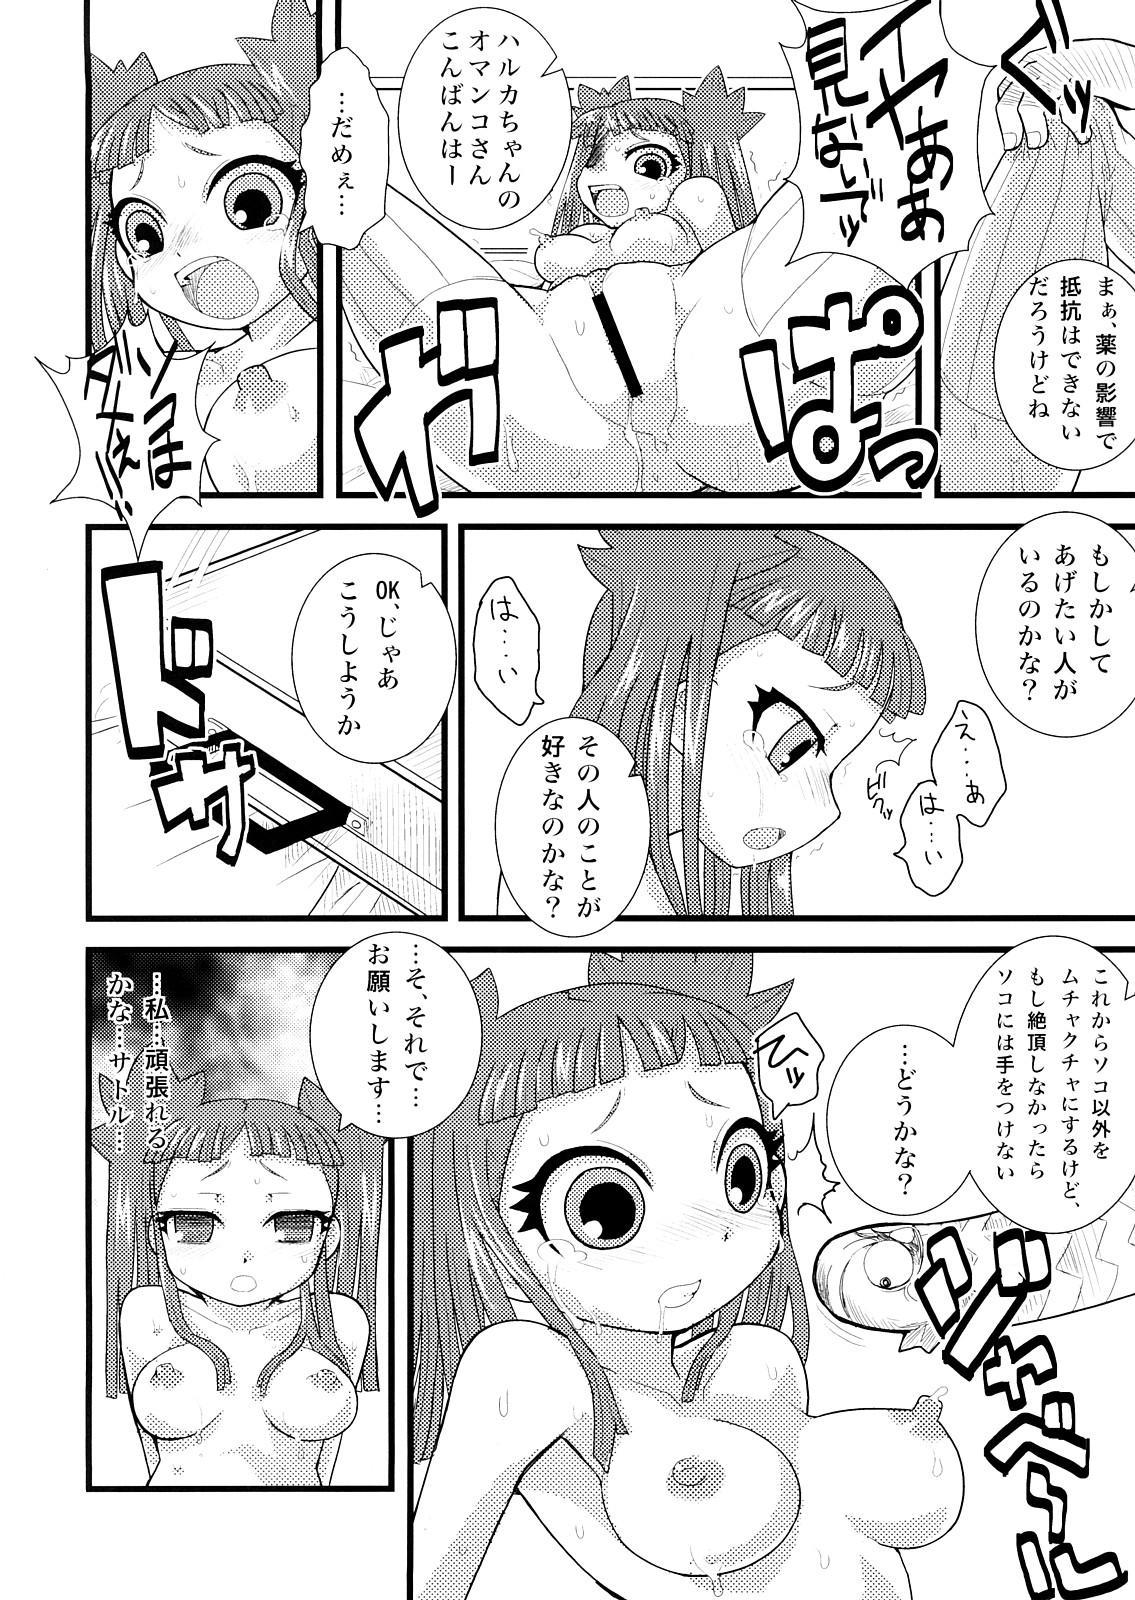 DS tte Omoshiroi Game ga Ookute Suteki 24